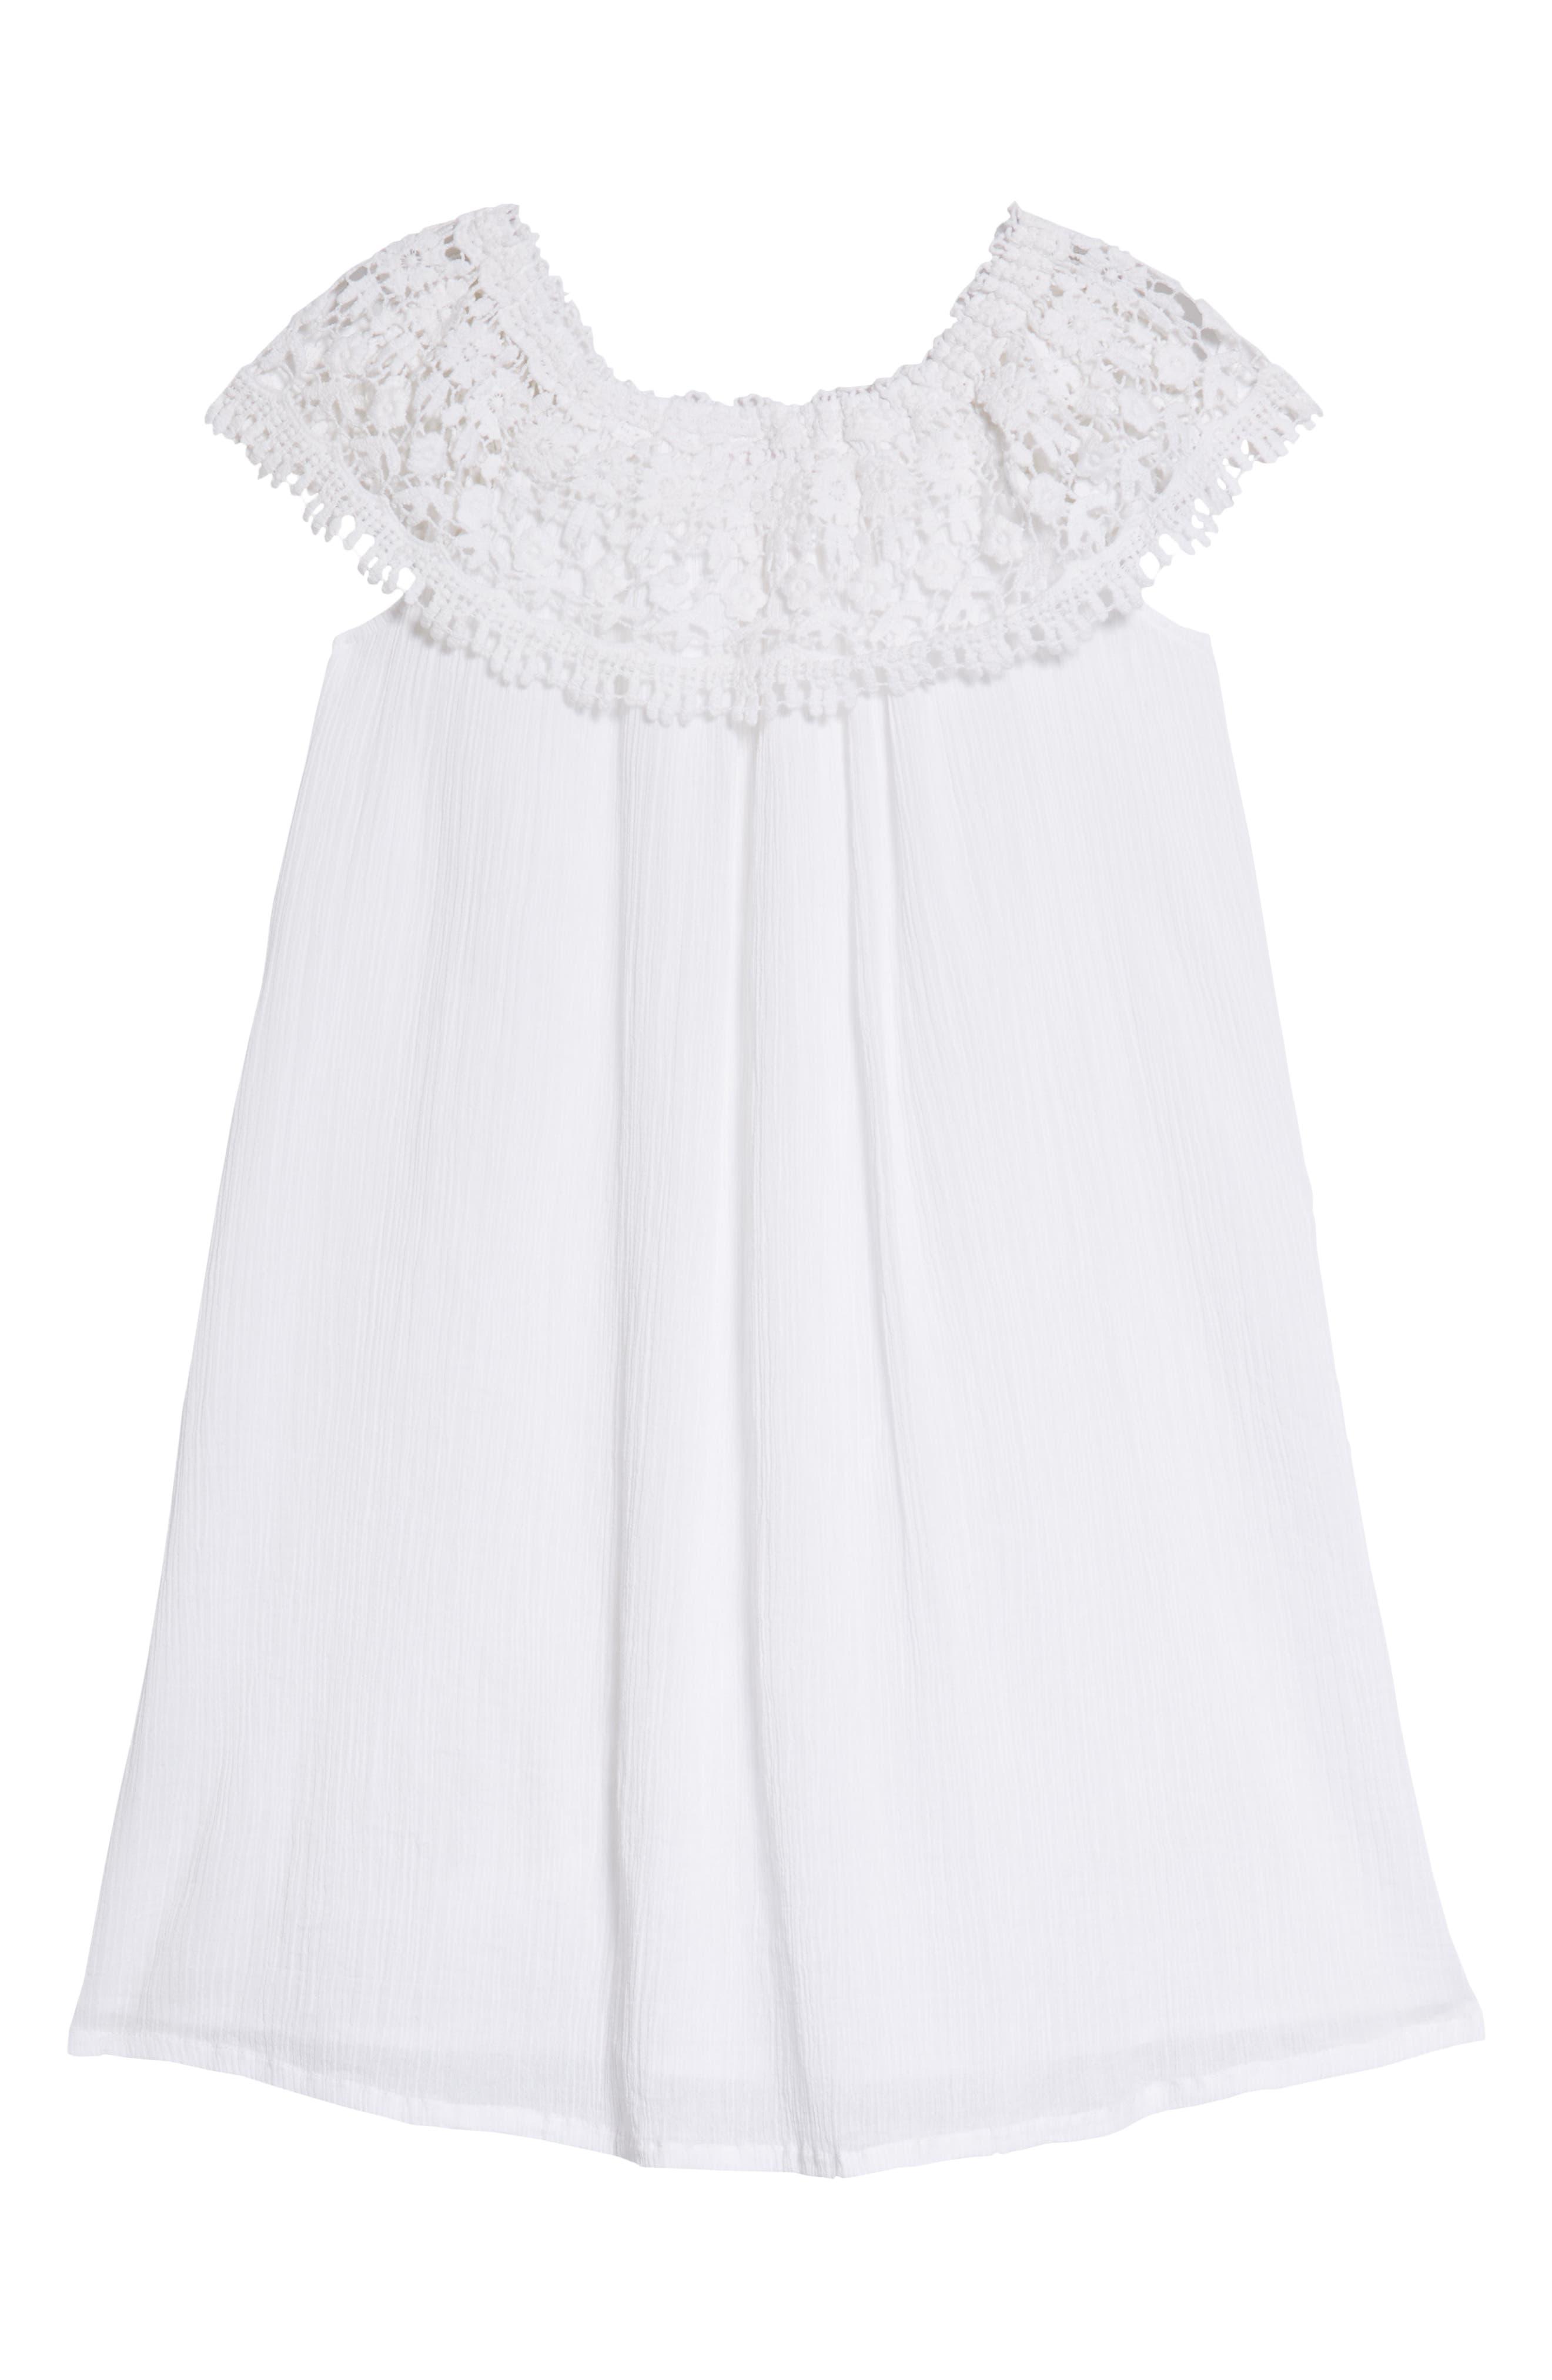 Lace Swing Dress,                             Alternate thumbnail 2, color,                             White